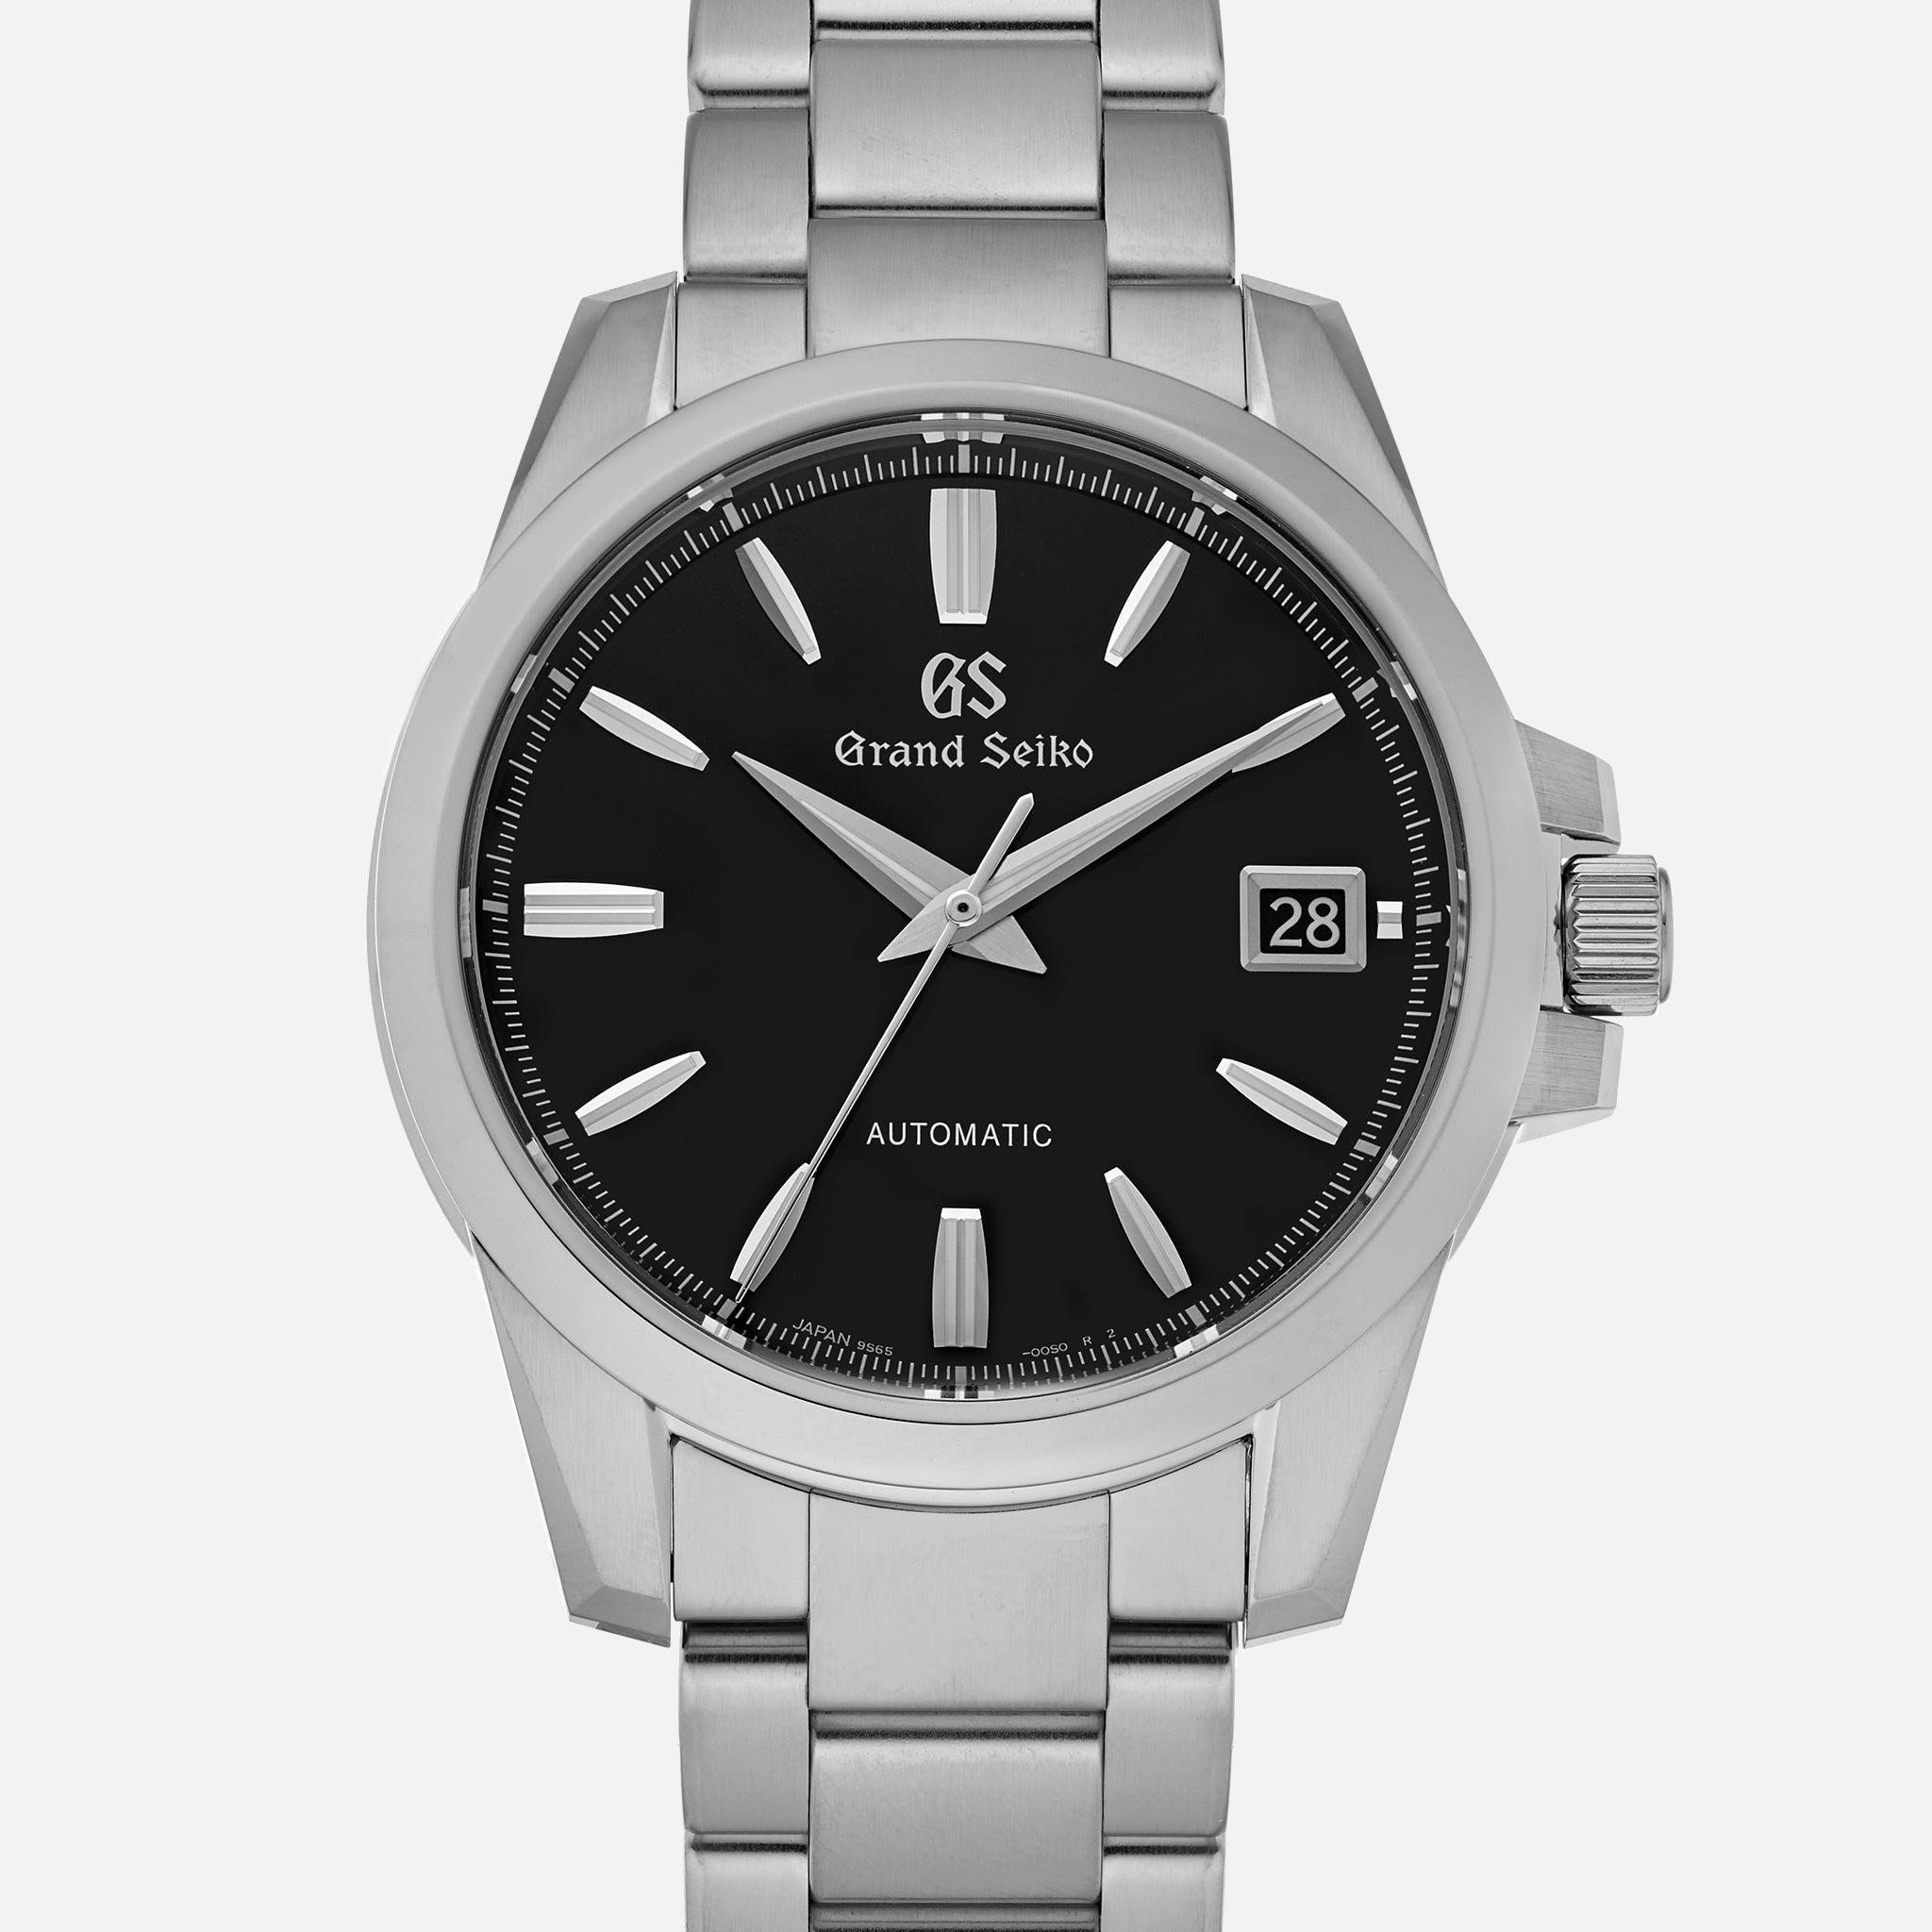 9396c8964 Grand Seiko Automatic Date 42mm SBGR309 – HODINKEE Shop